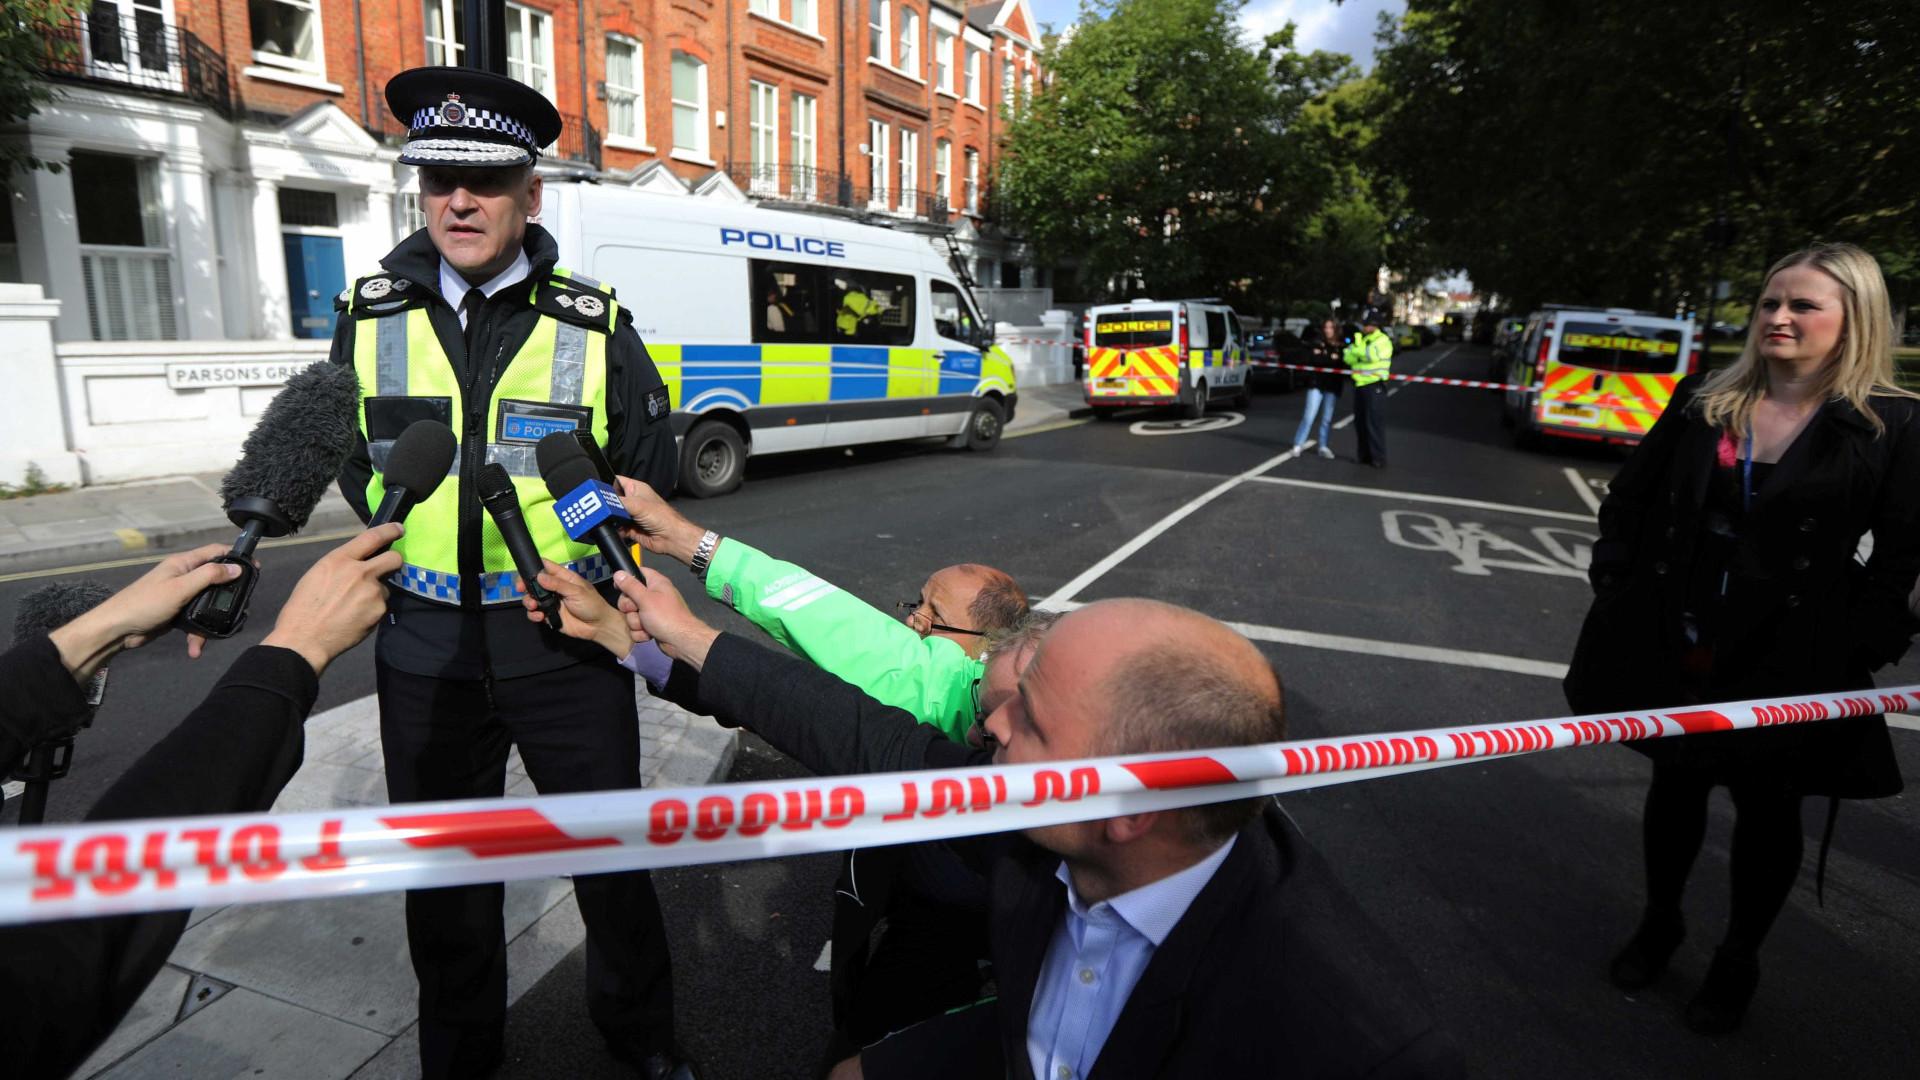 Identificado suspeito de estar envolvido na explosão de Londres